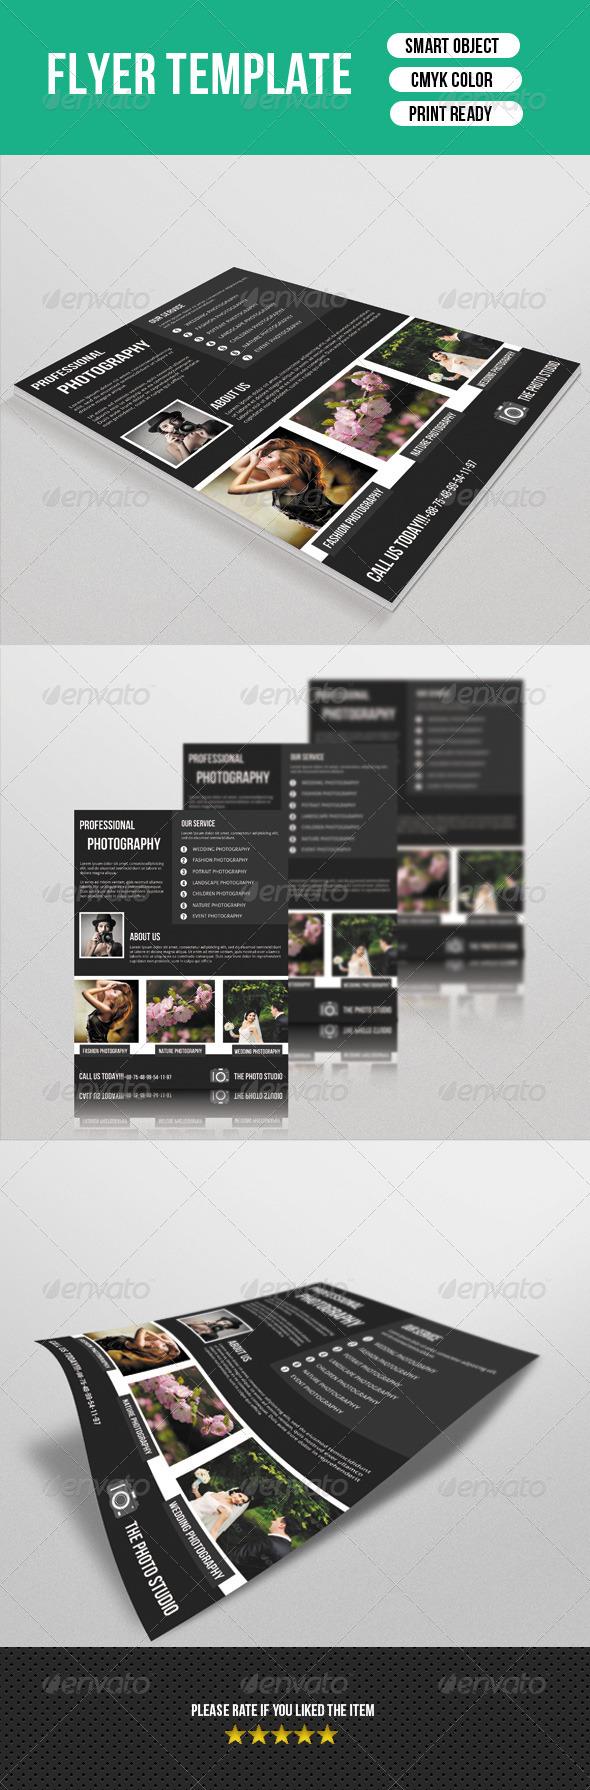 Photography Flyer Template-V14